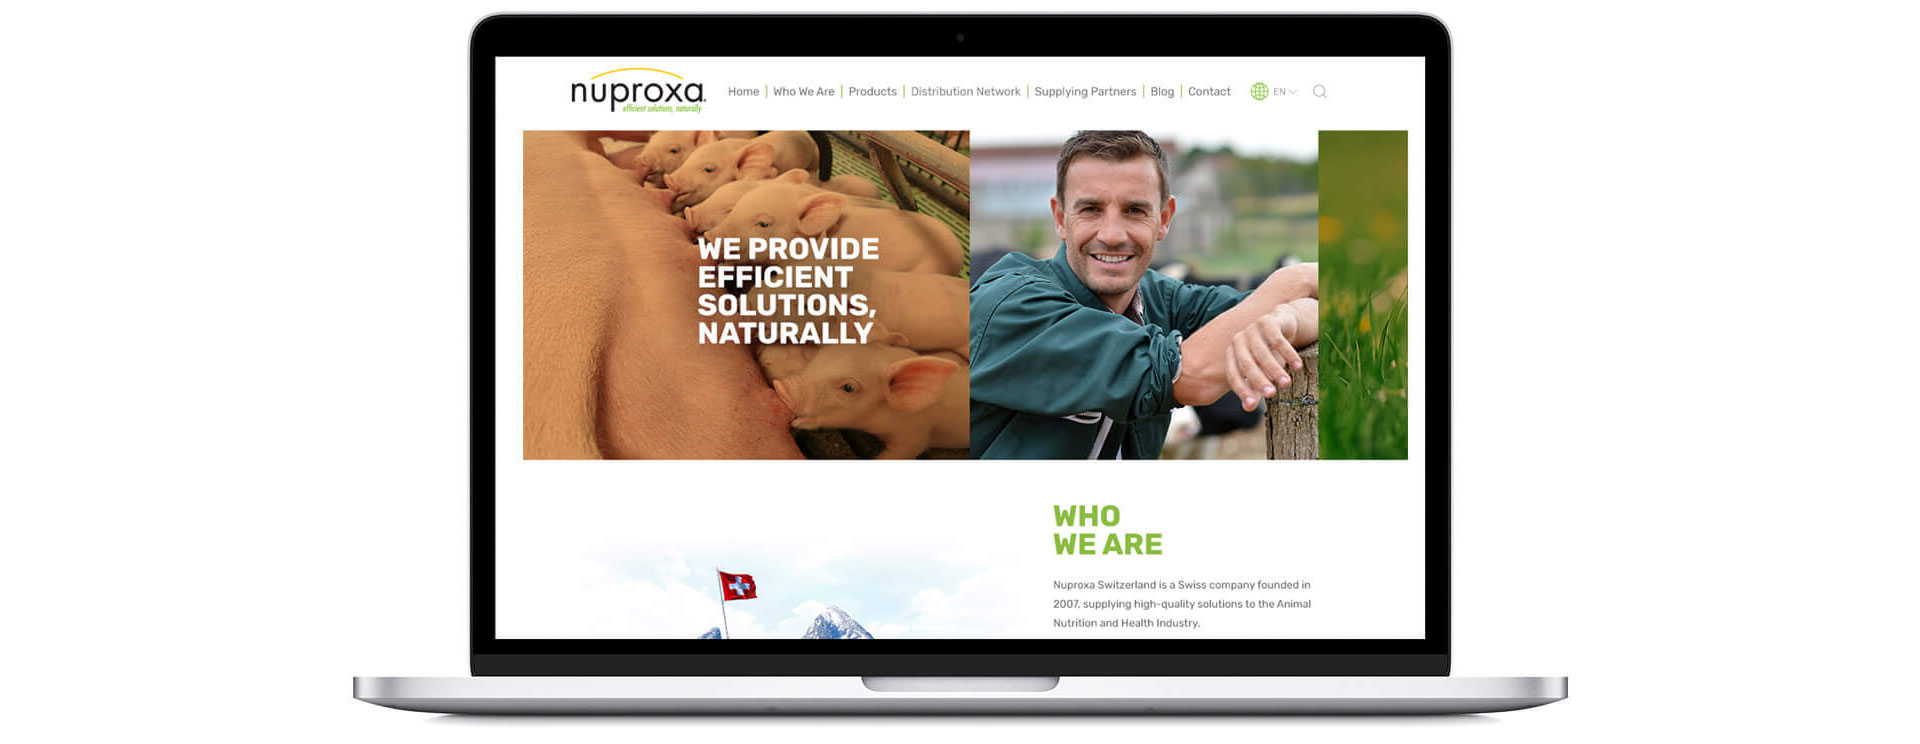 Website Nuproxa